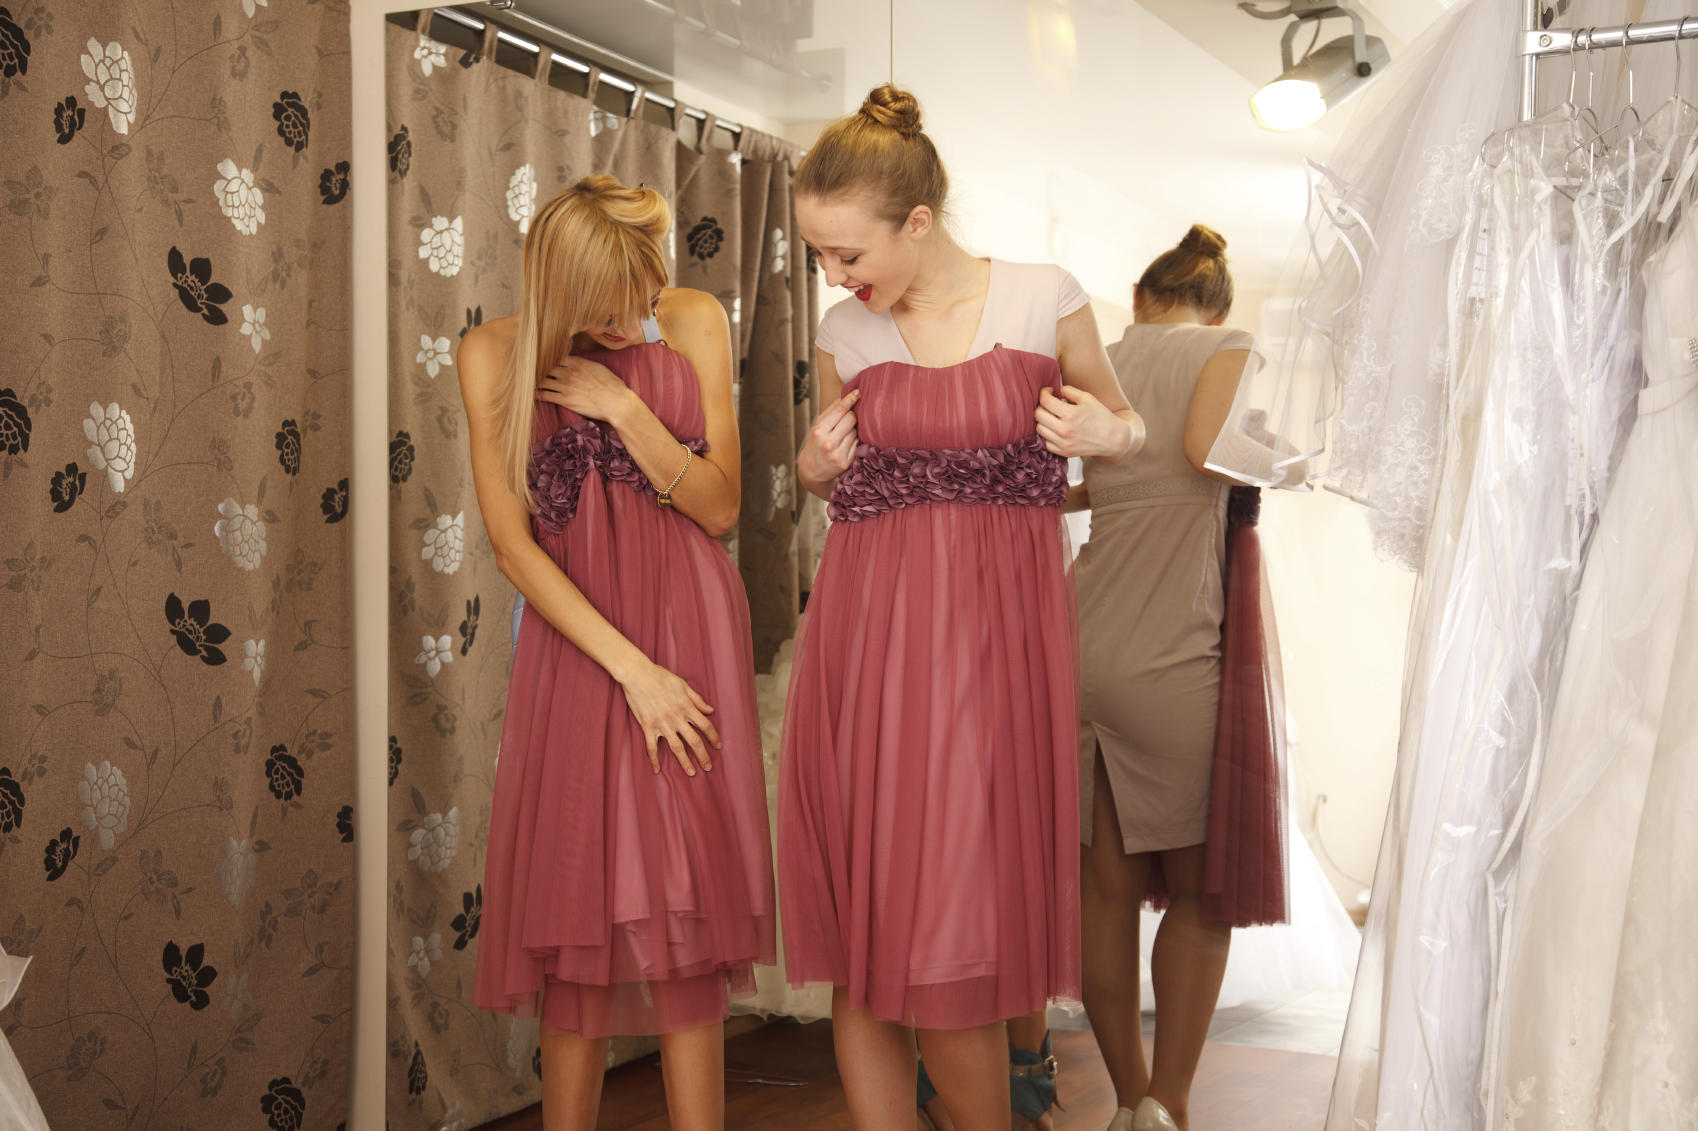 Having fun in bridal Boutique